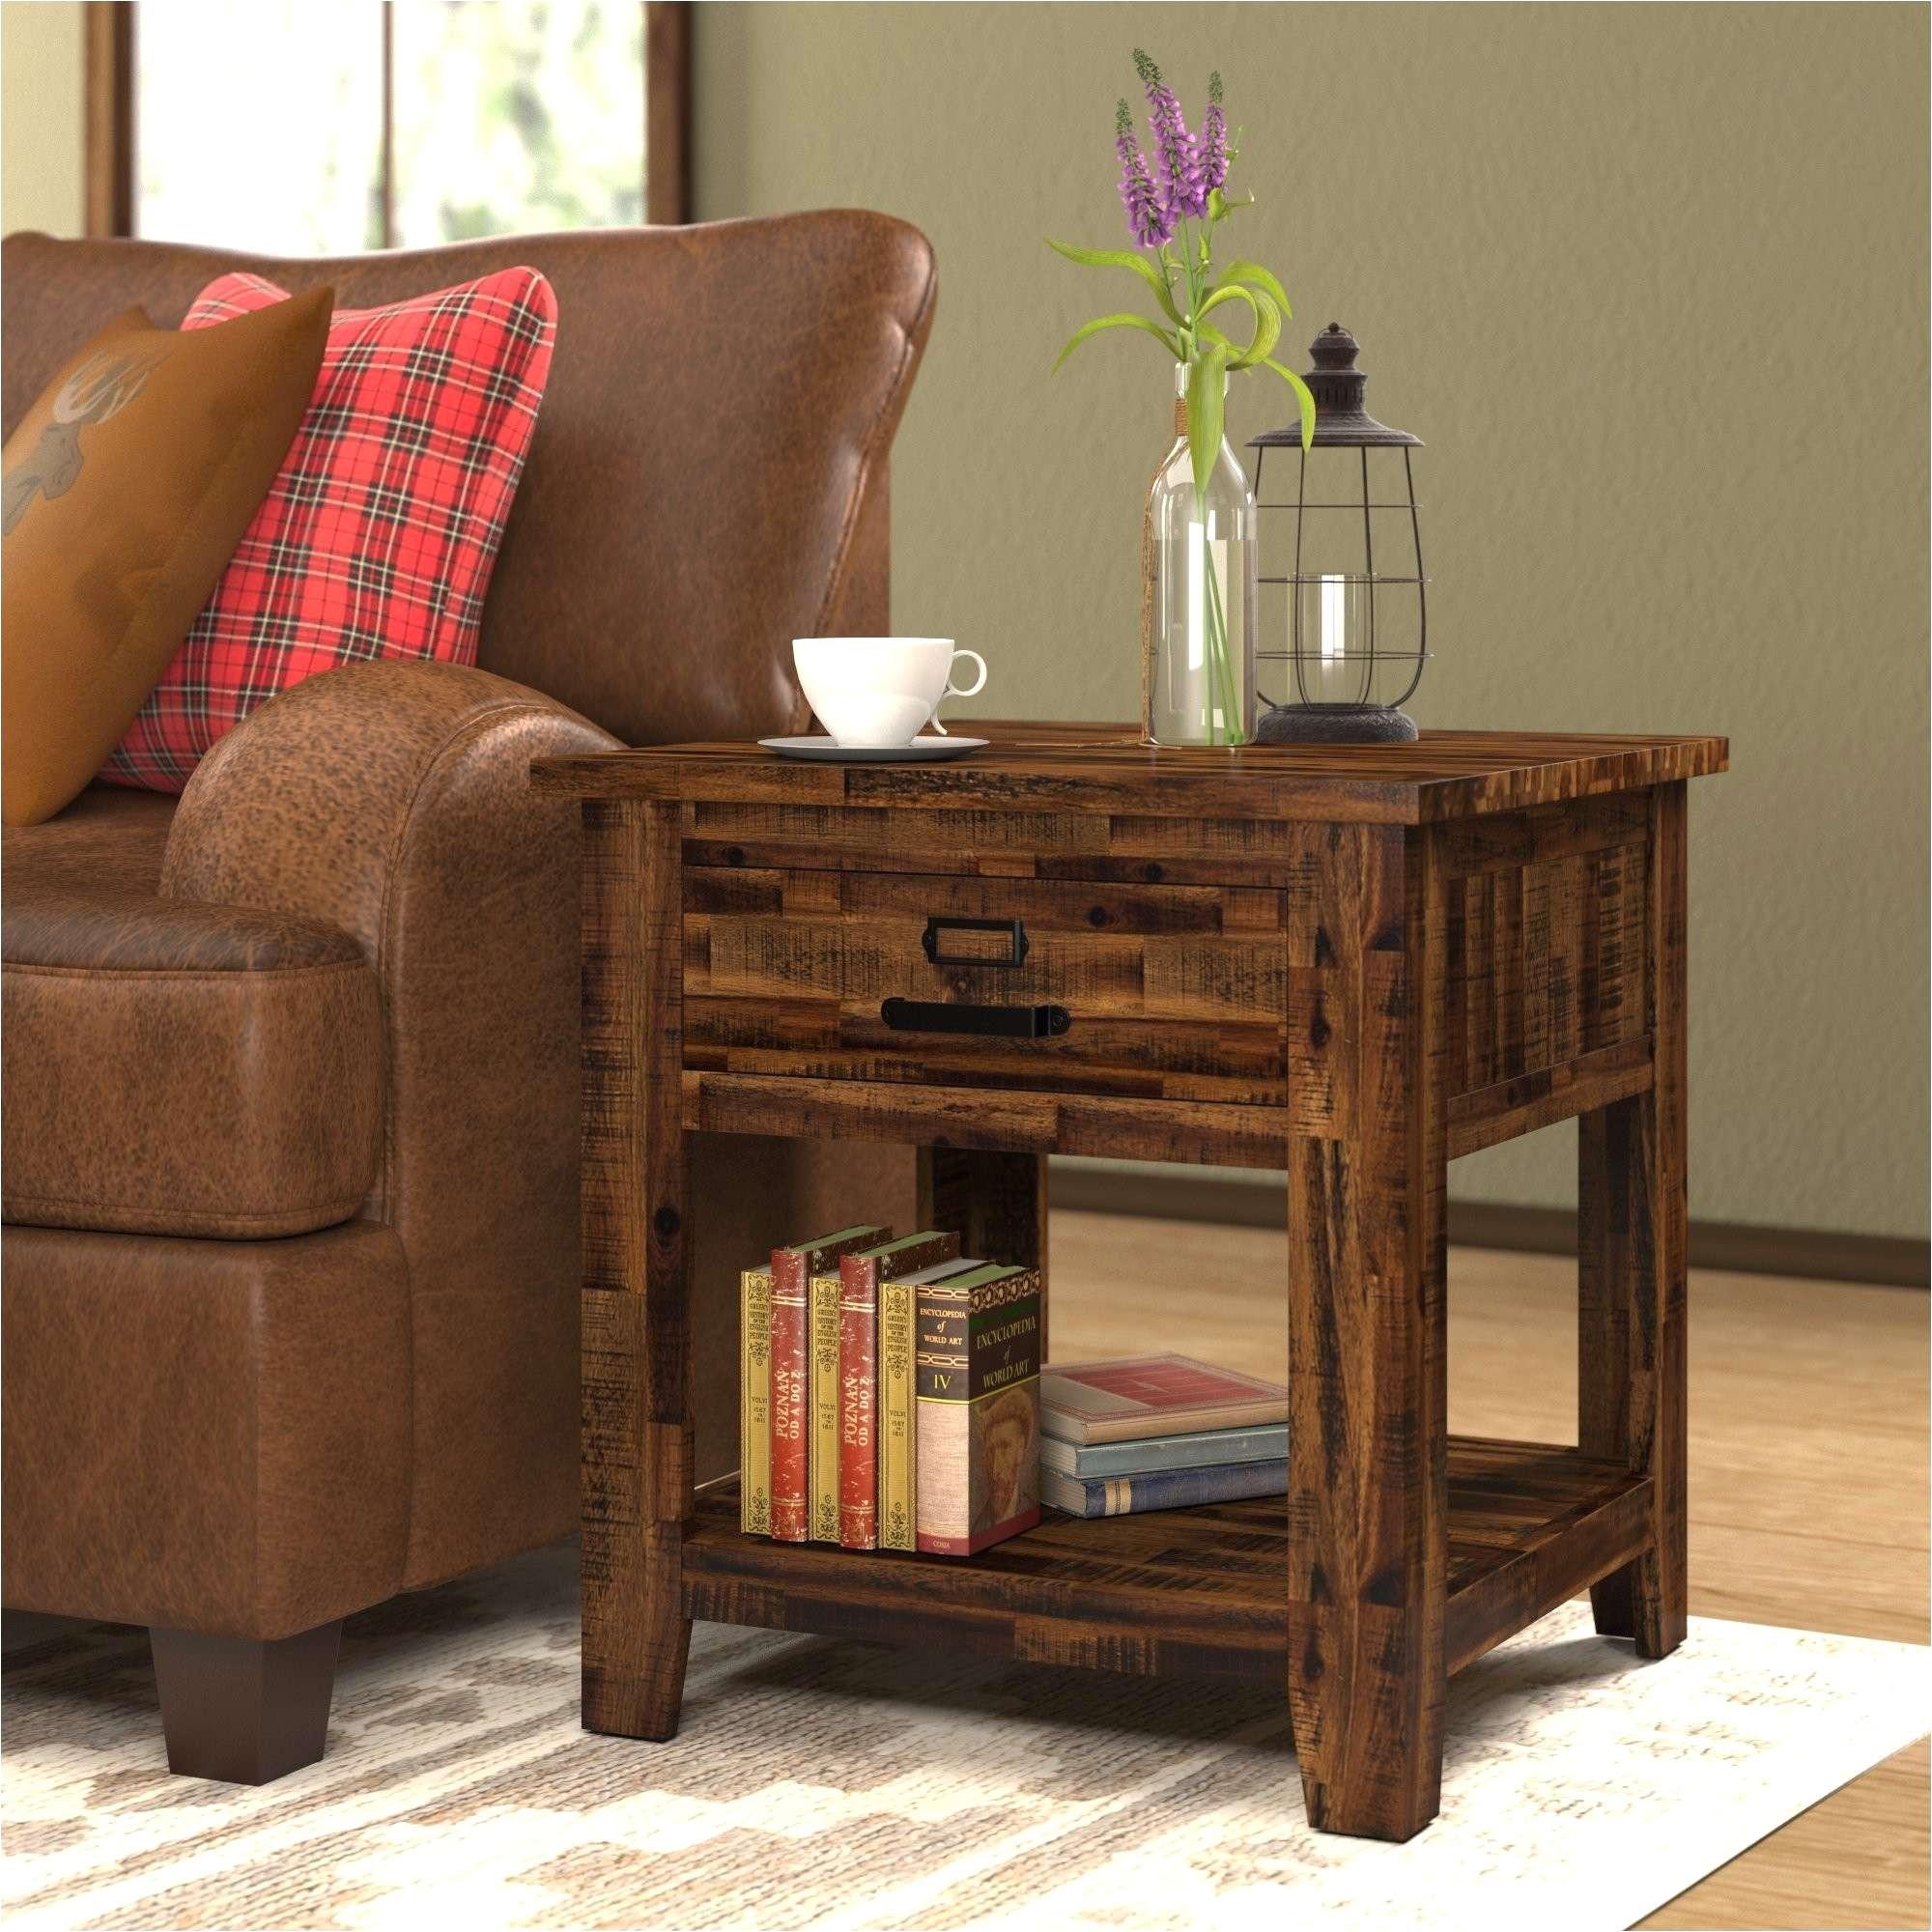 Enchanting Set 3 Living Room Tables Valid Glamorous Ebay Furniture Bedroom Sets At 22 Beautiful Ebay Living